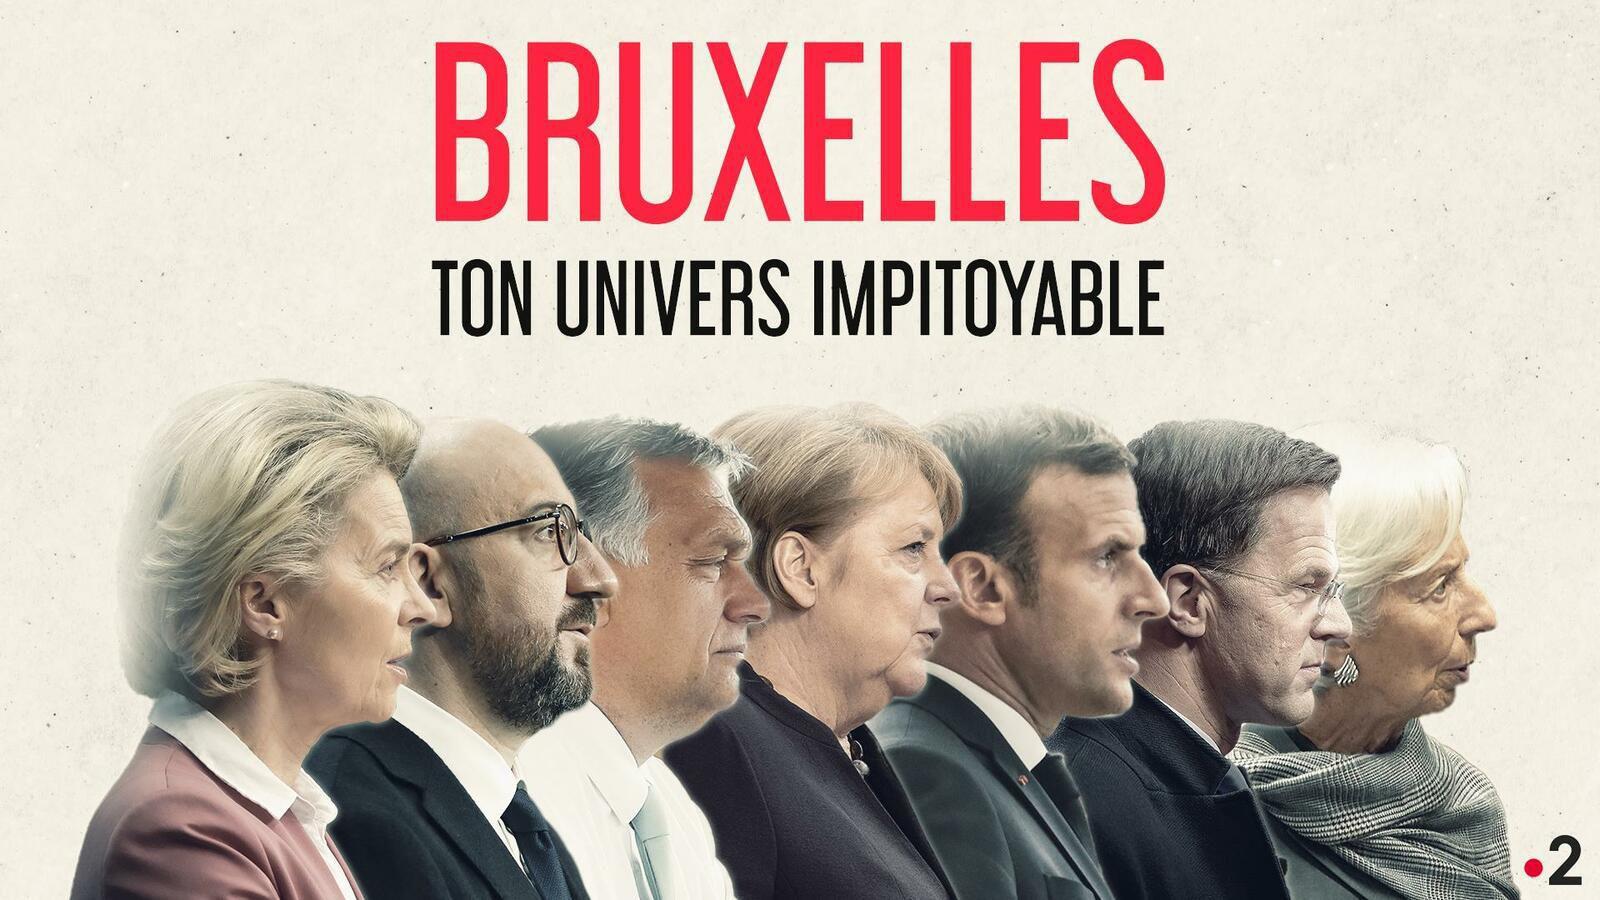 Bruxelles, ton univers impitoyable - Documentaire (2021)